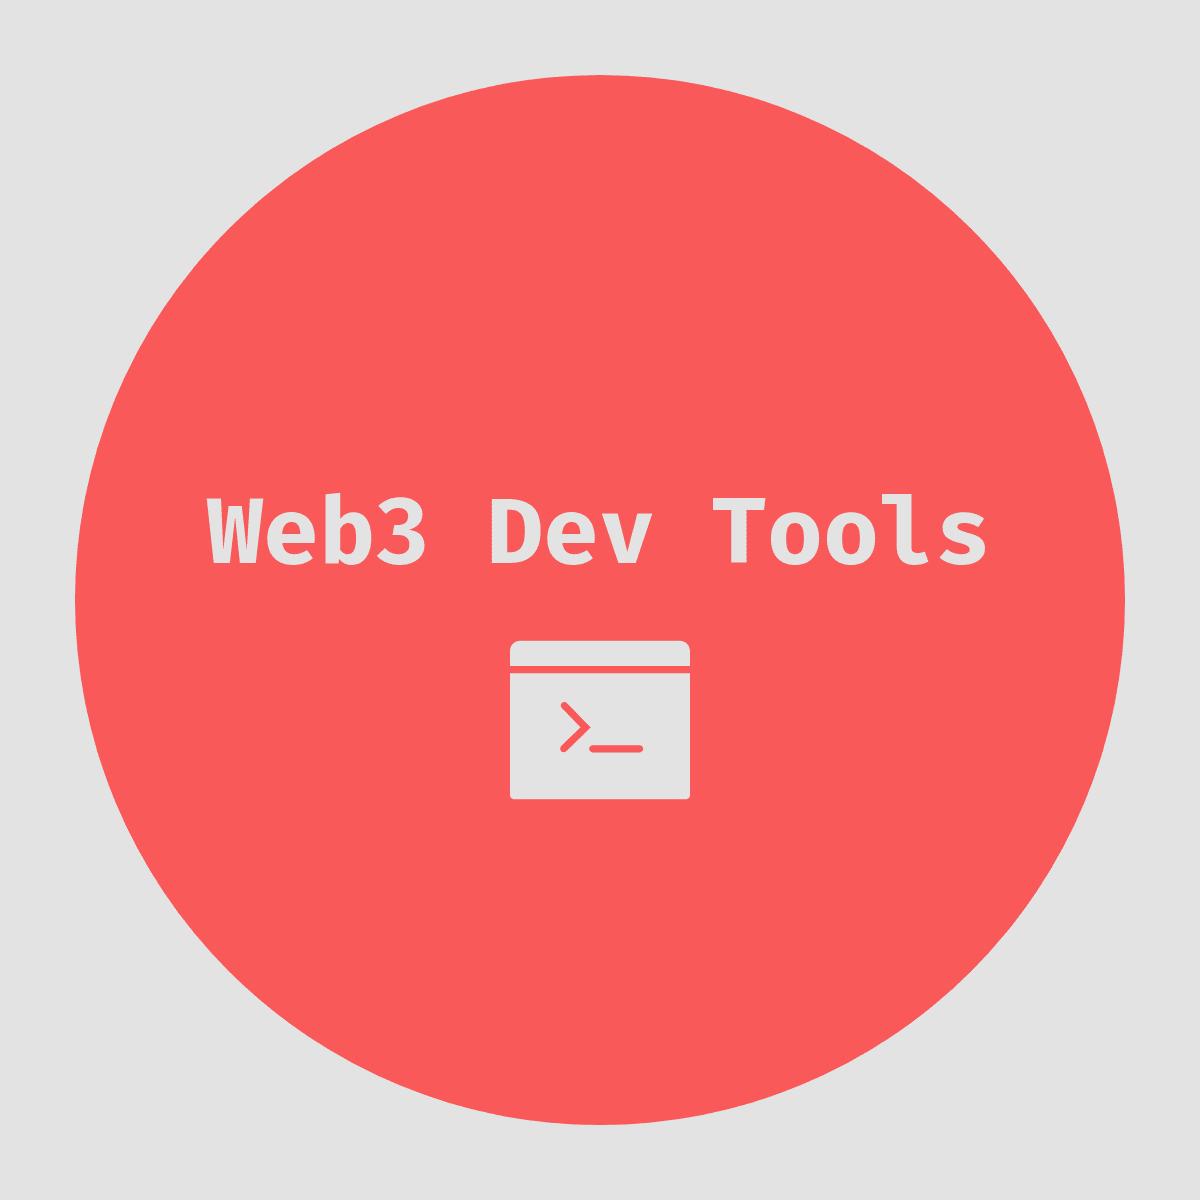 Web3 Dev Tools